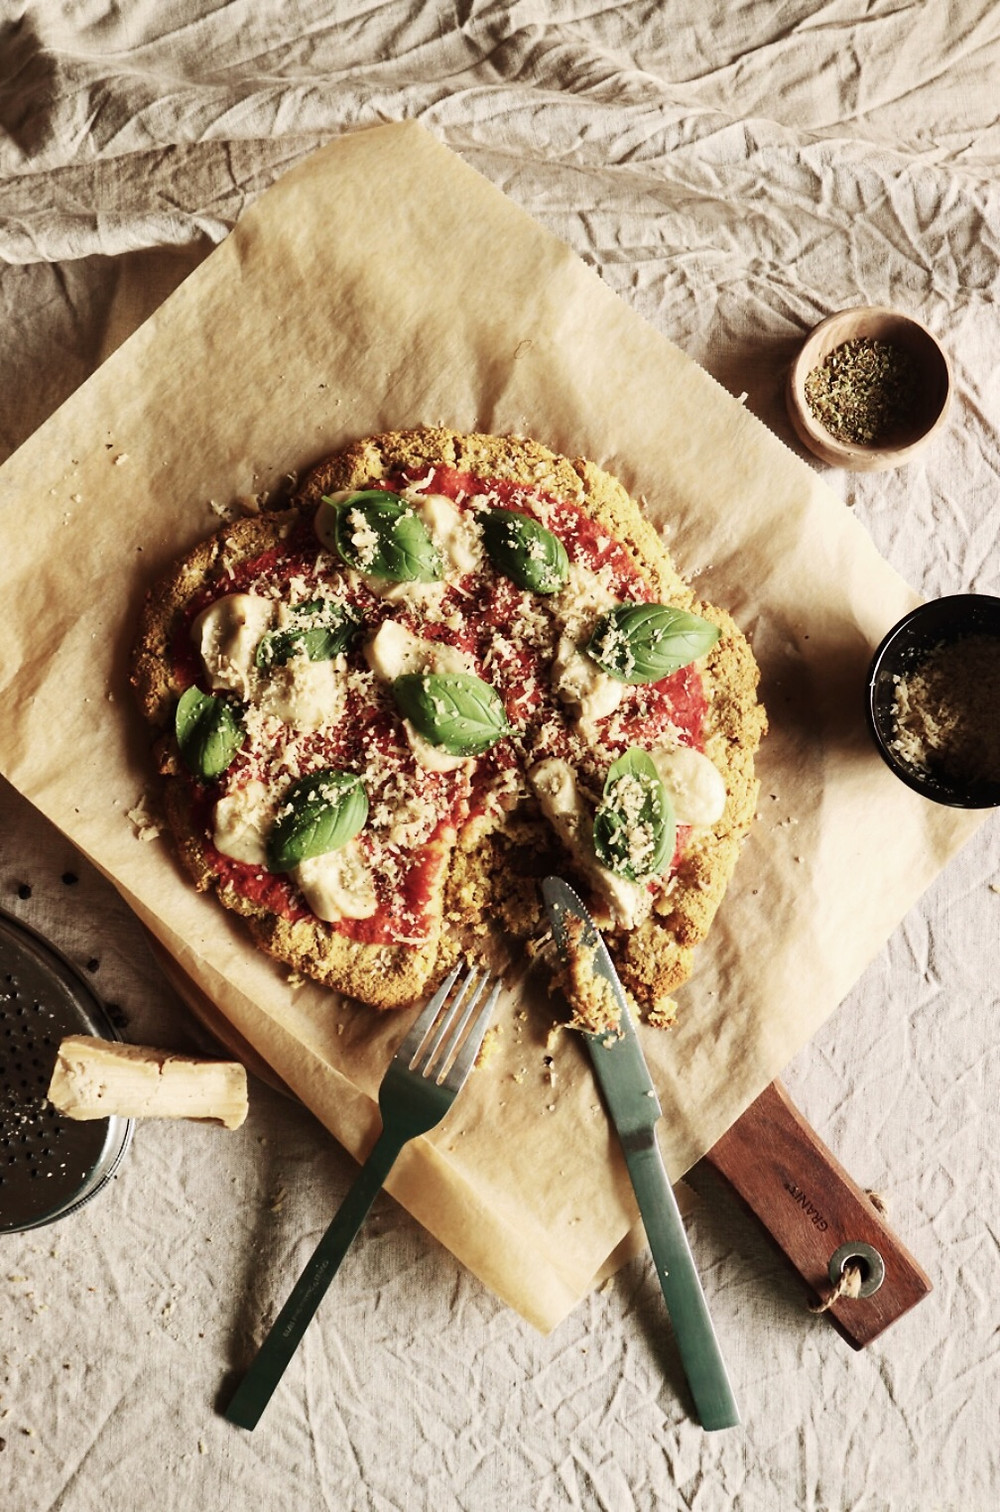 homemade plant-based pizza